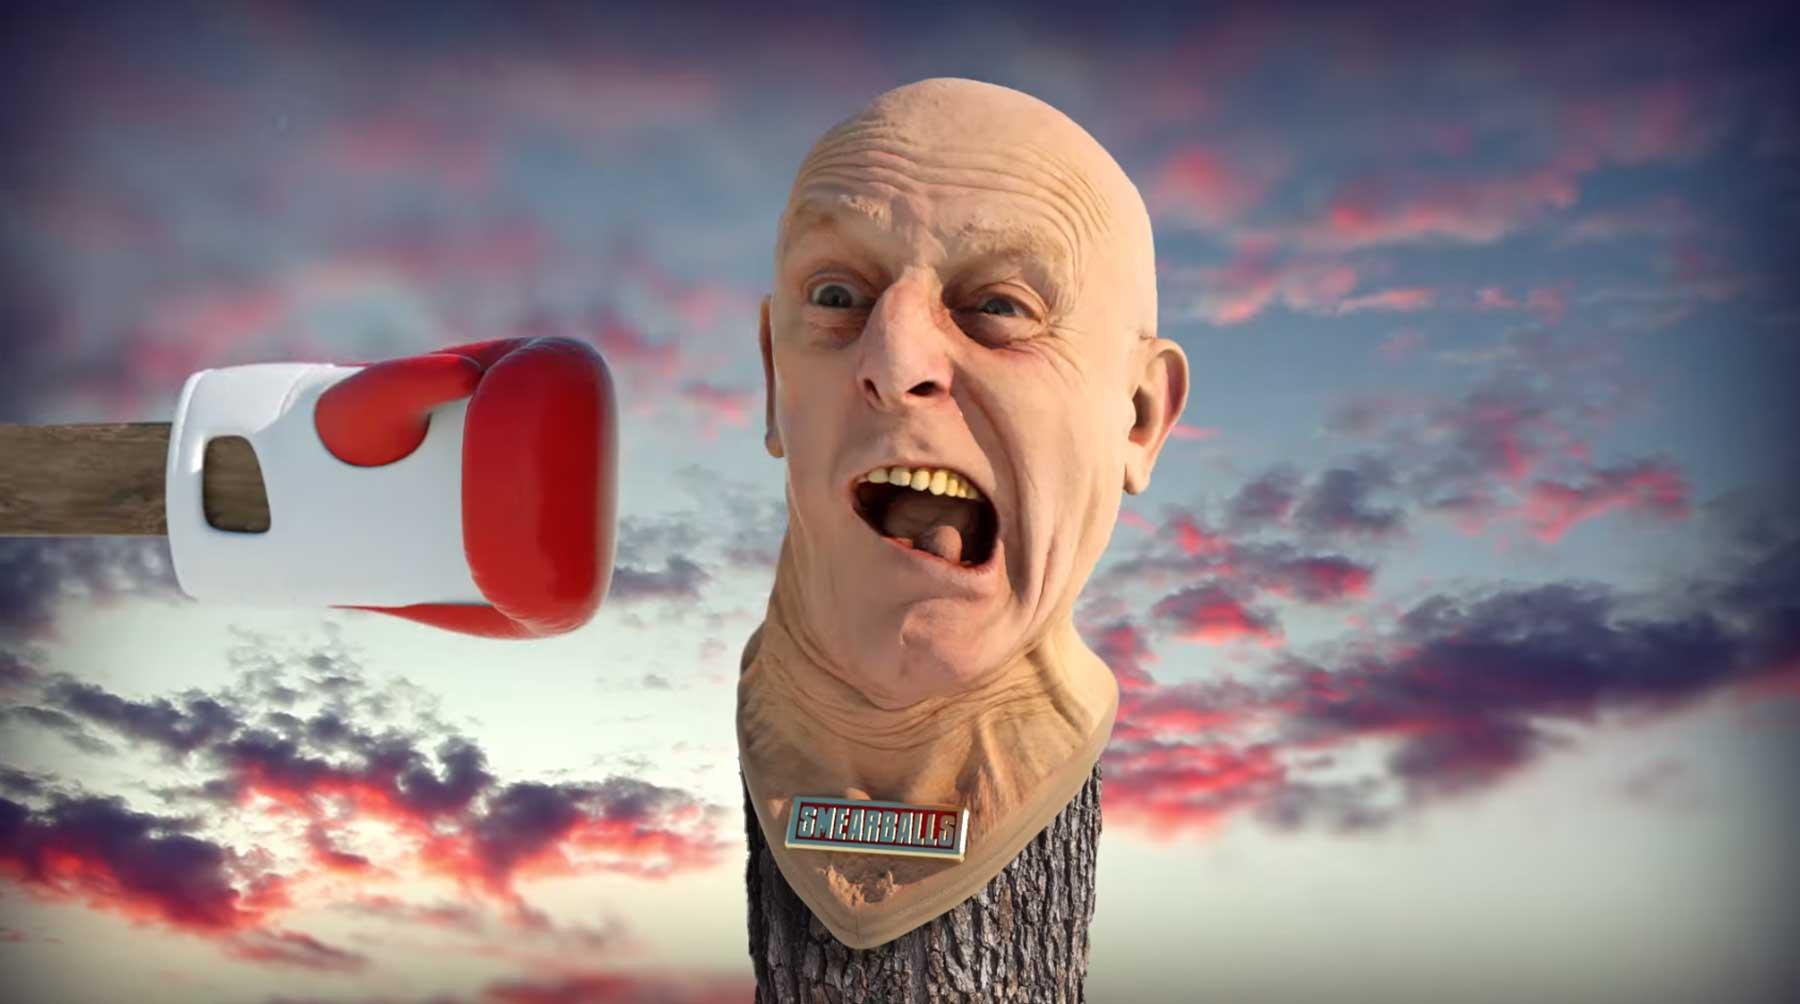 Abgefuckt-surreal-lustige WTF?!-Animation SMEARBALLS-Octane